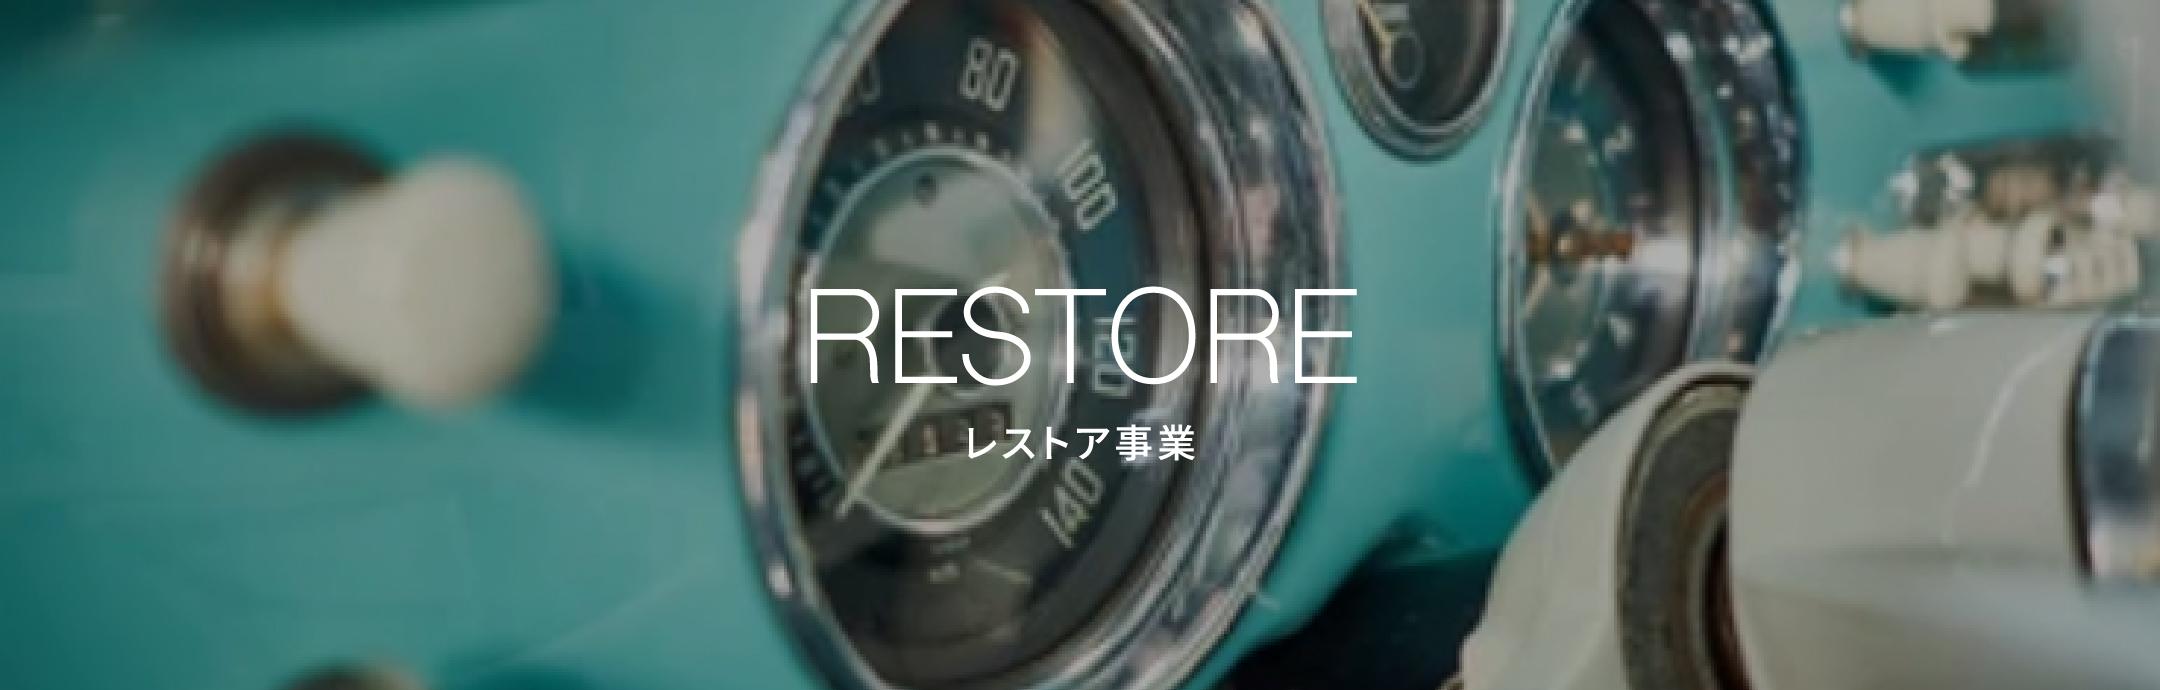 RESTORE/レストア事業